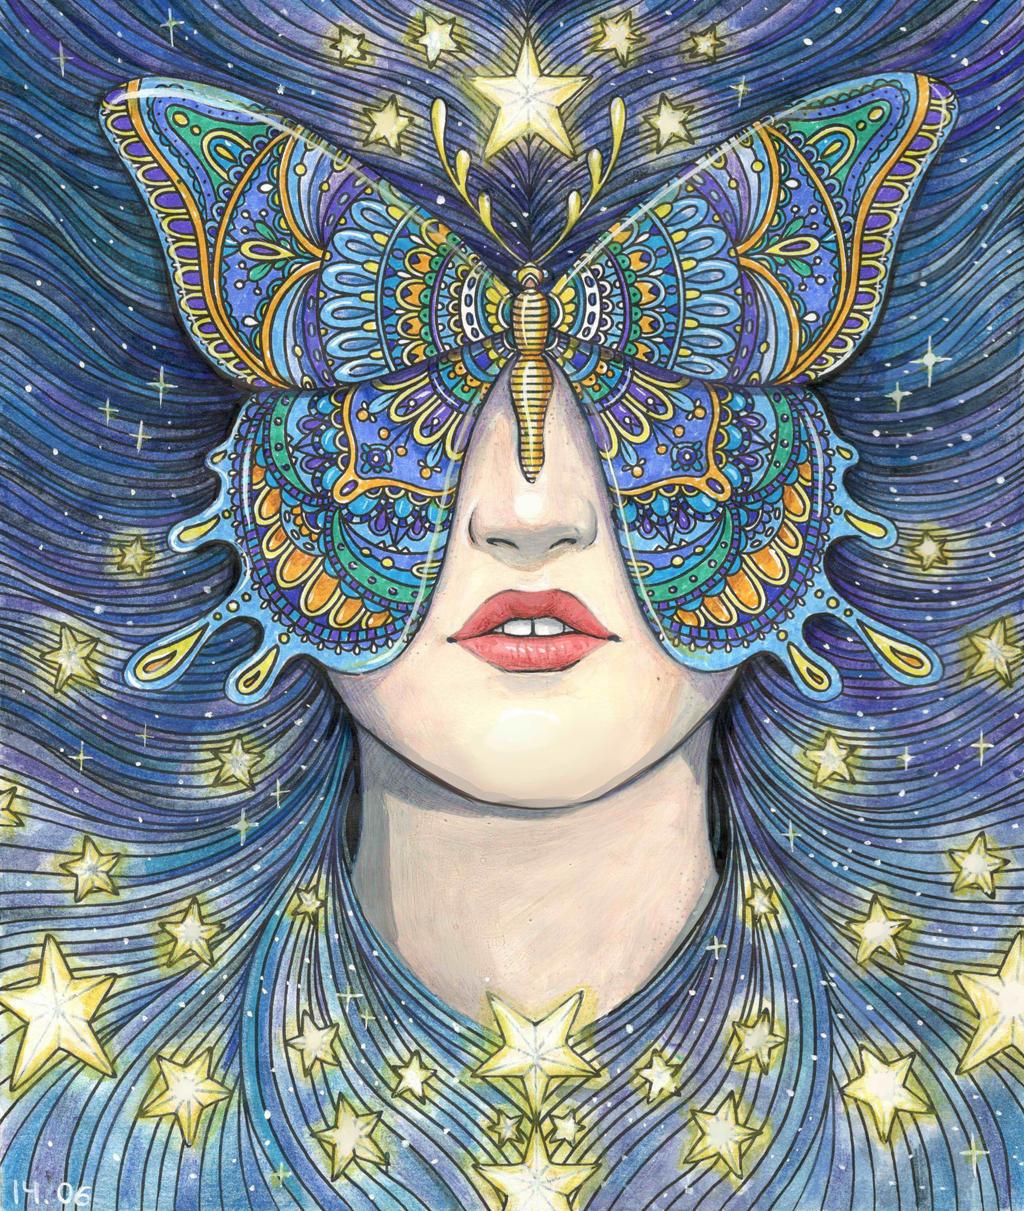 Hanna Karlzon Star butterfly by Juli556